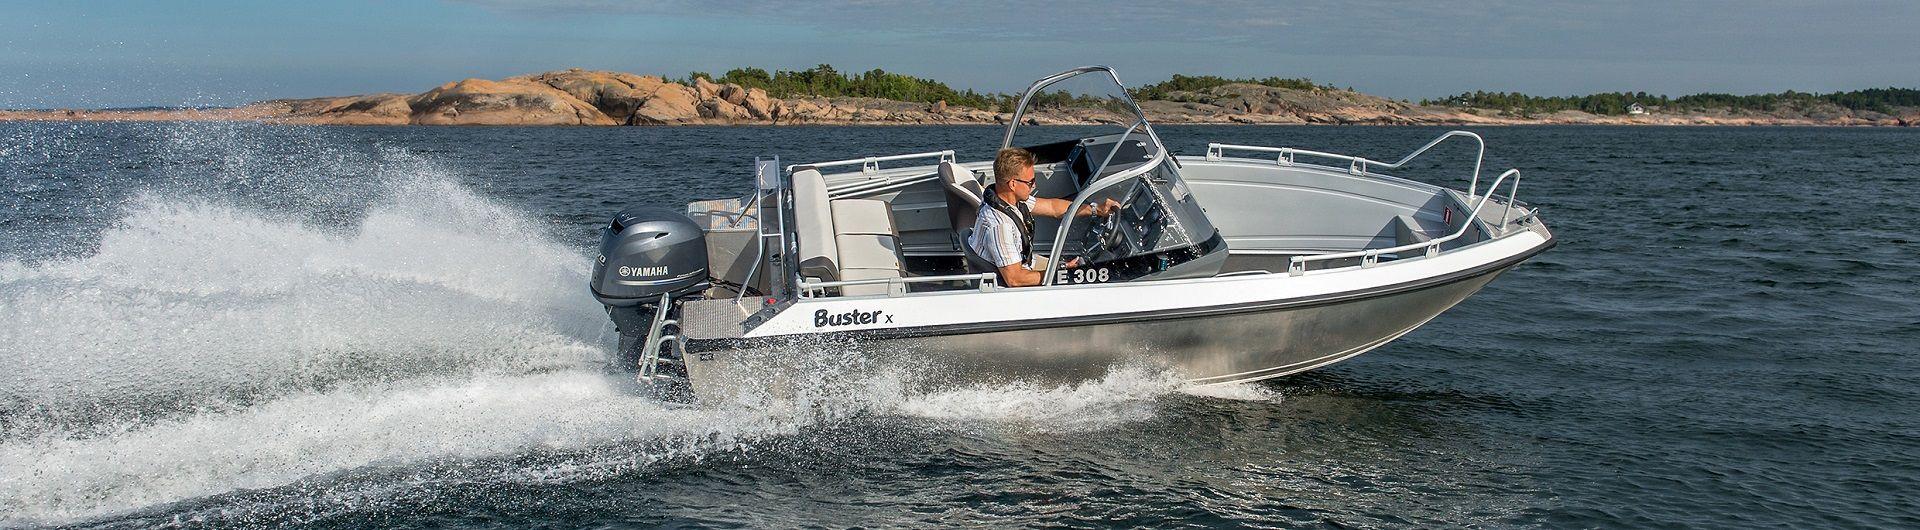 Sportboot Aluminiumboot Buster X header